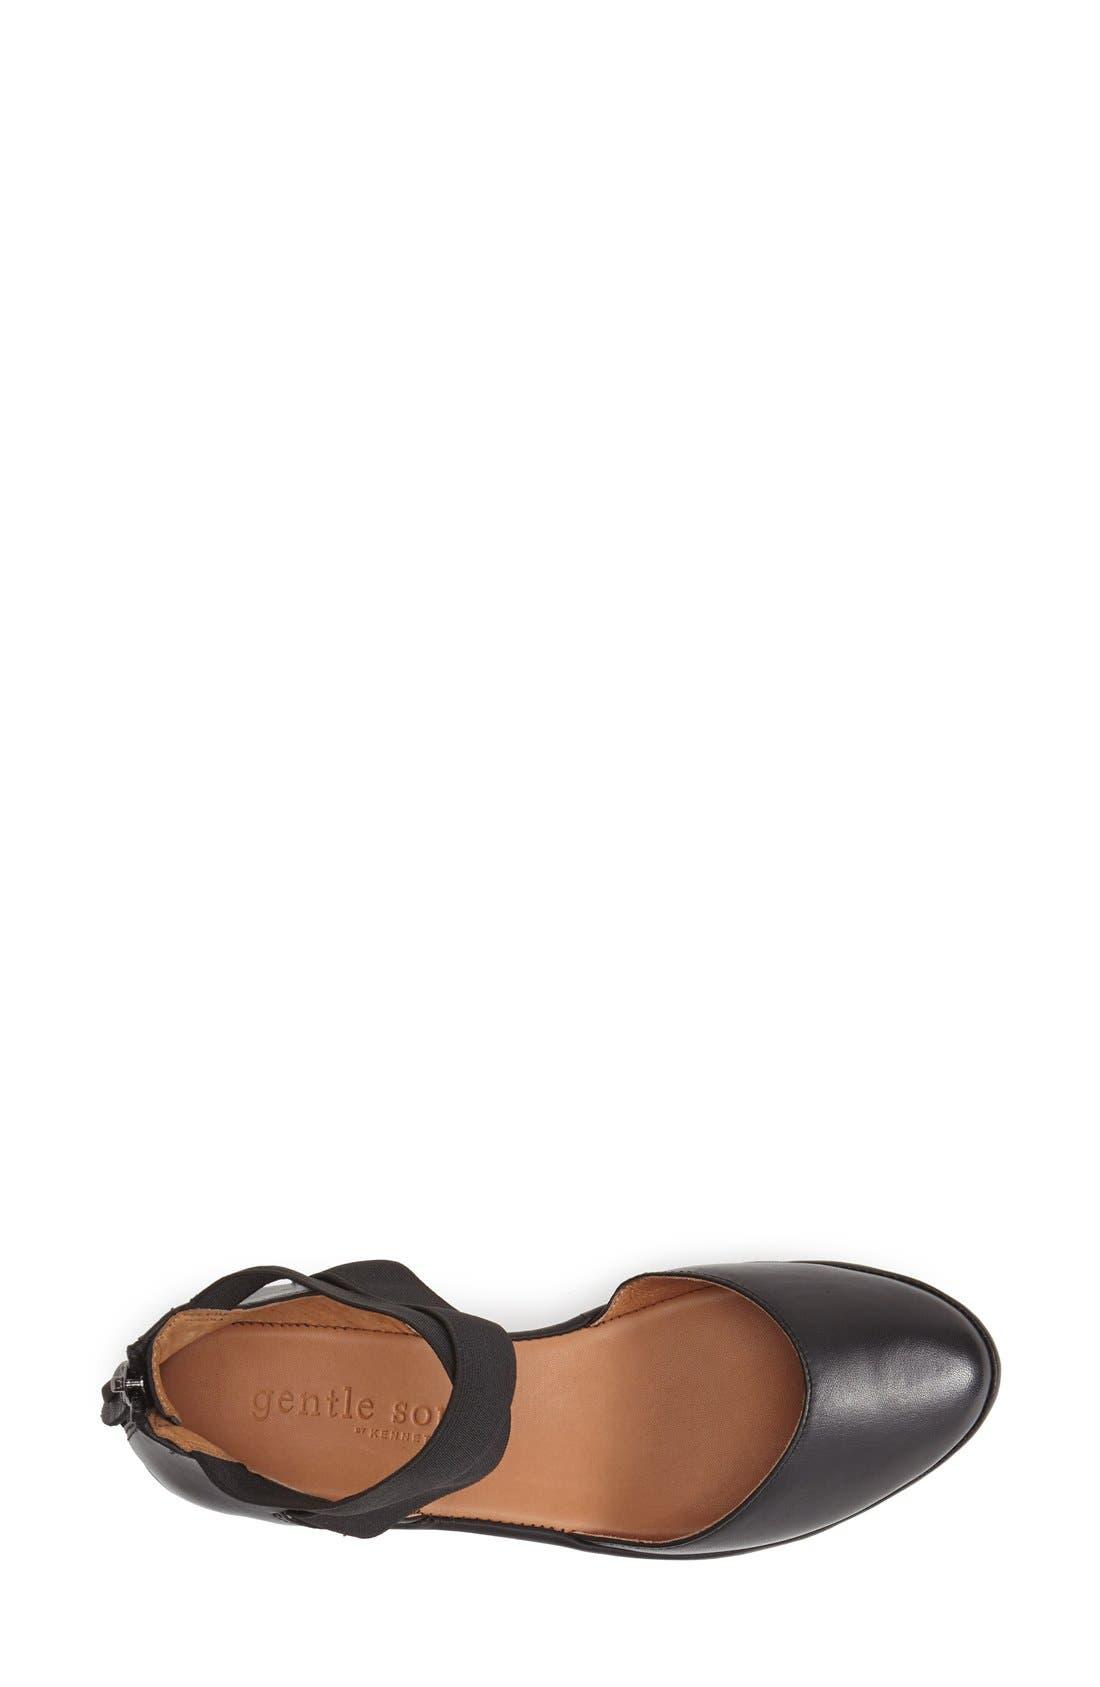 GENTLE SOULS BY KENNETH COLE, 'Noa' Elastic Strap d'Orsay Sandal, Alternate thumbnail 3, color, BLACK